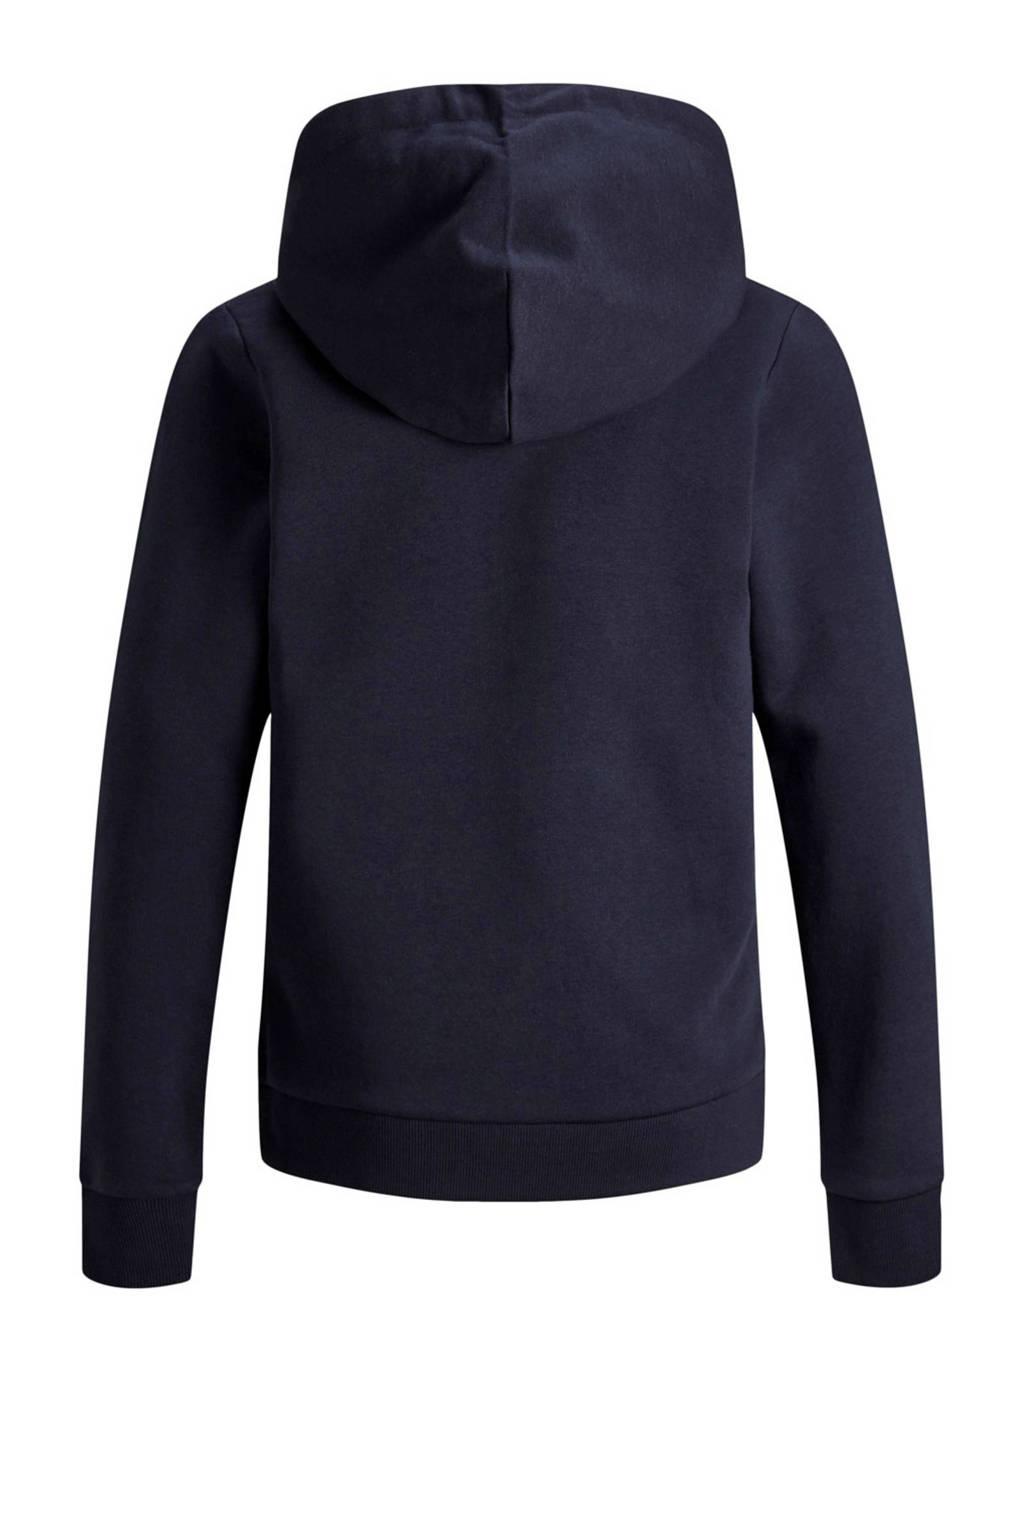 Jack & Jones Junior hoodie met kangeroezak blauw, Donkerblauw